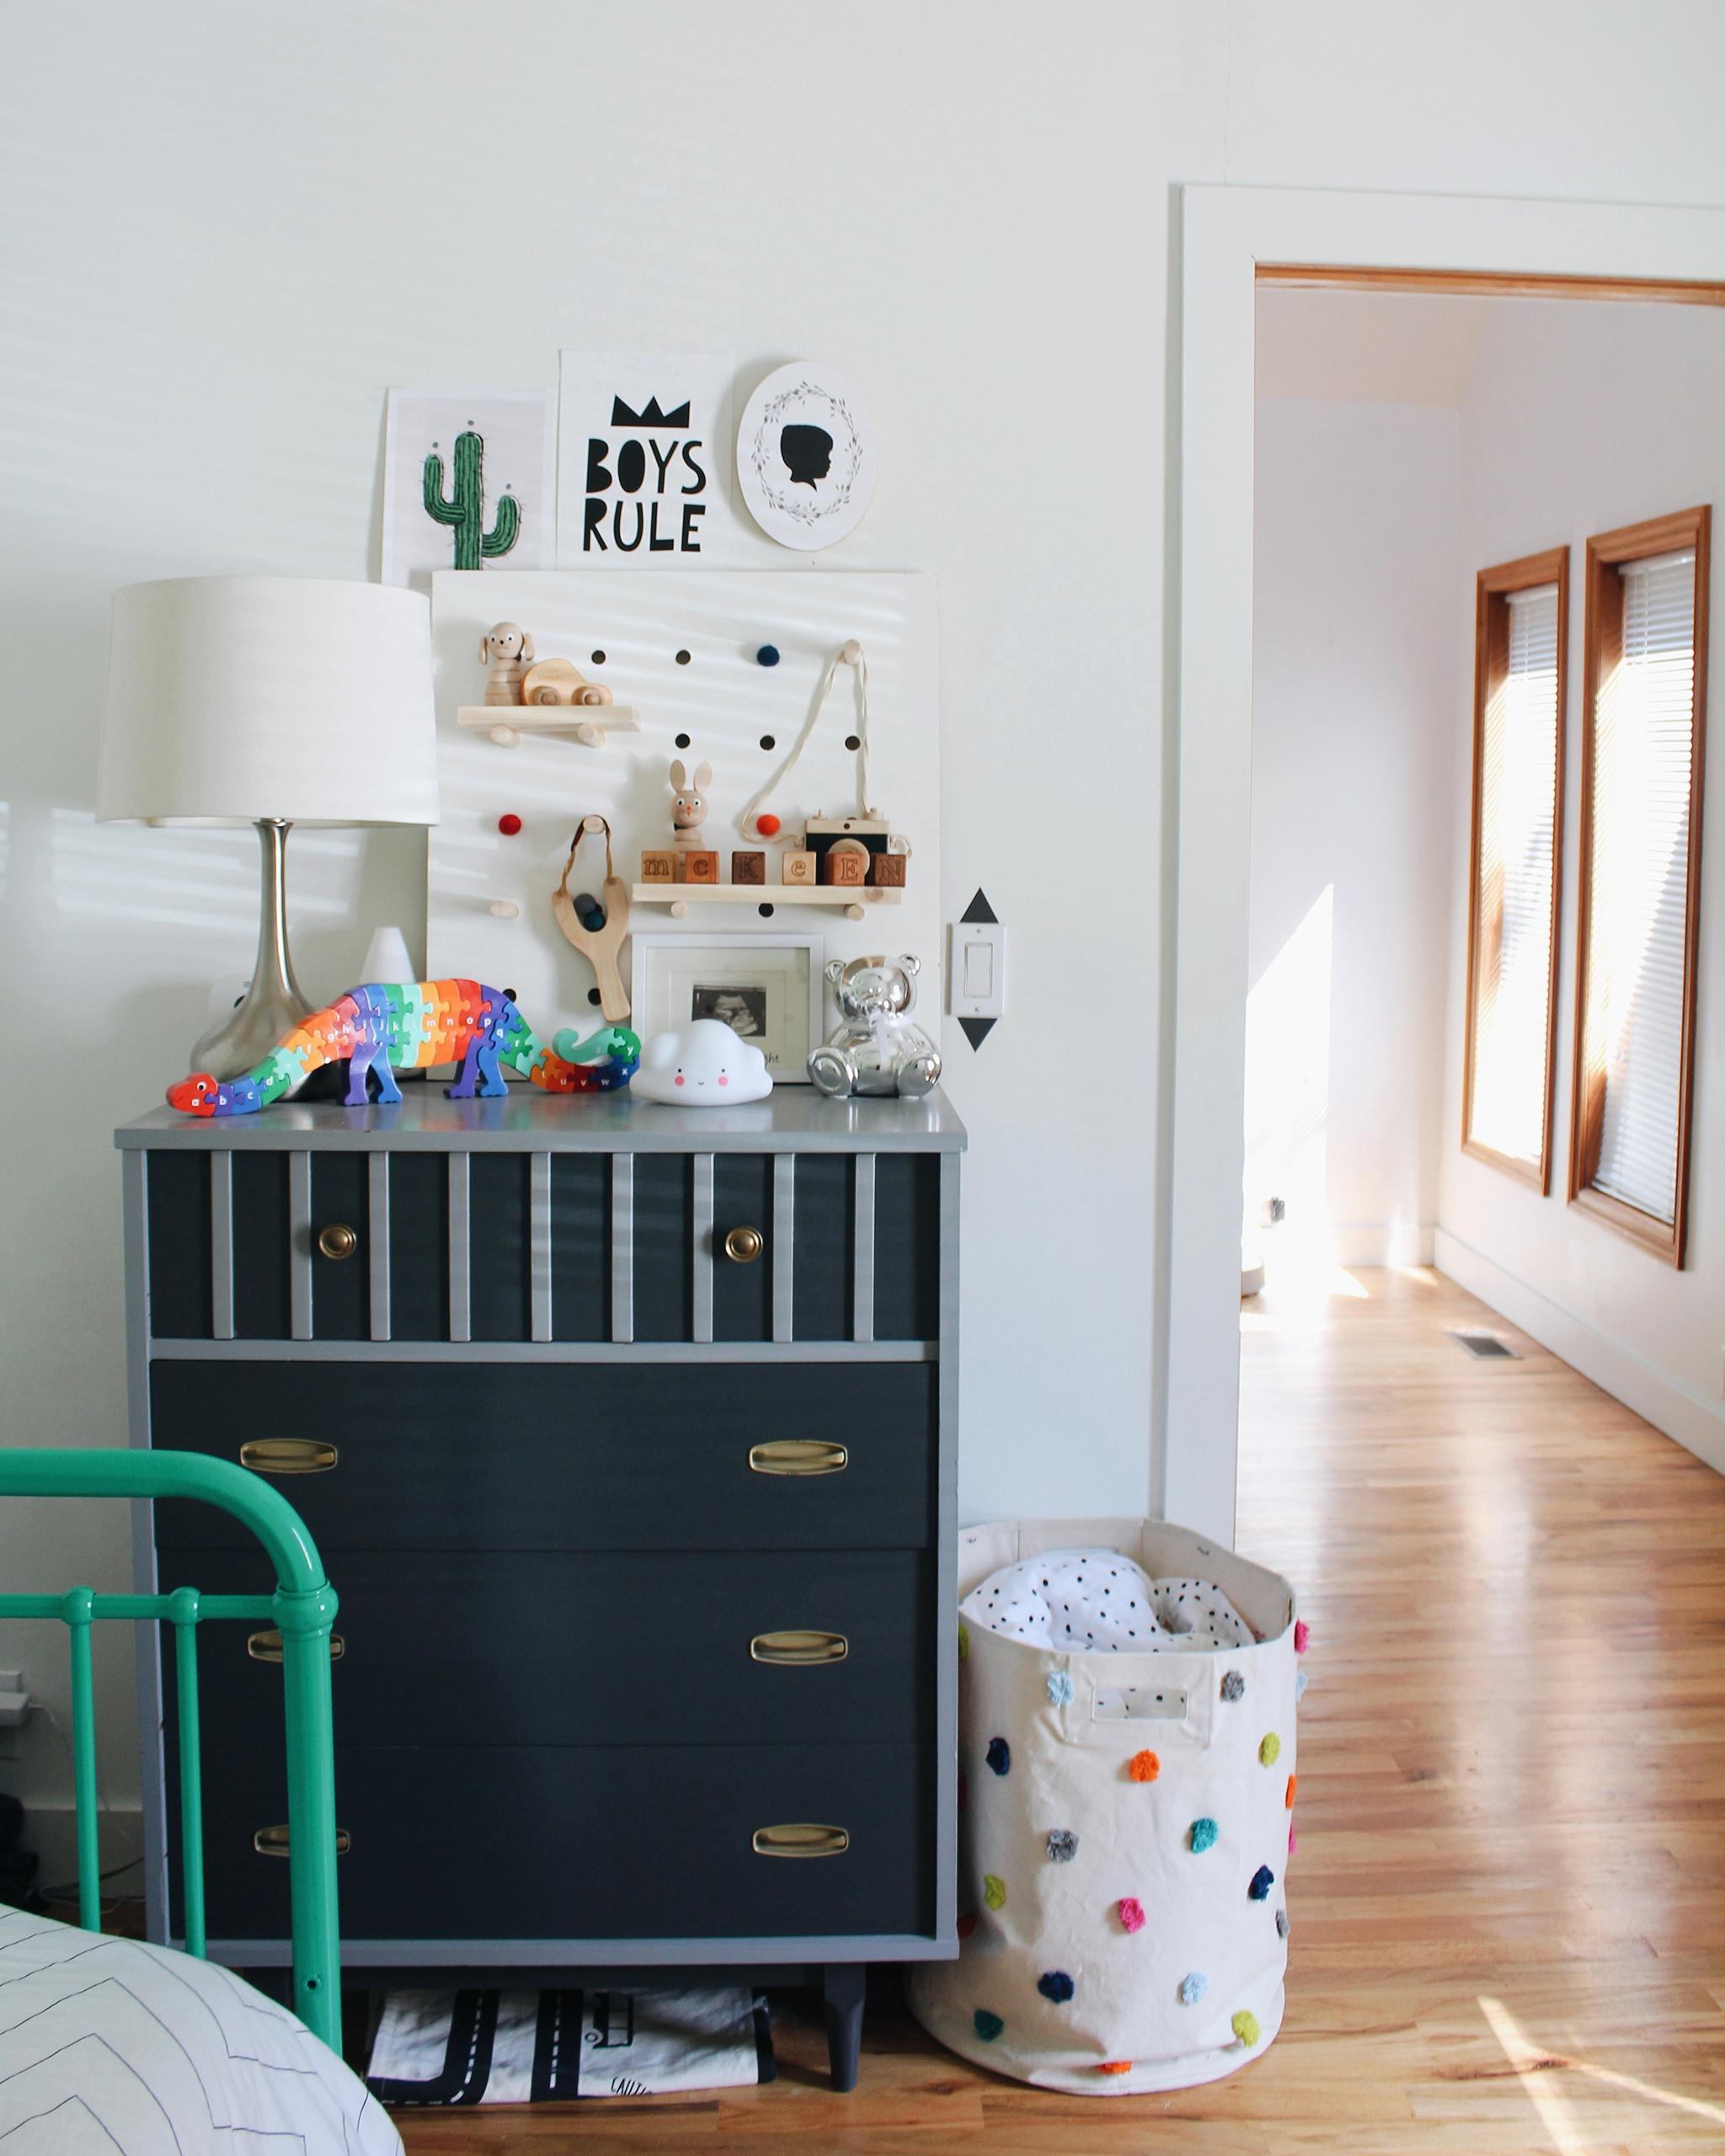 Shared Boys Room Styled Dresser - Project Nursery